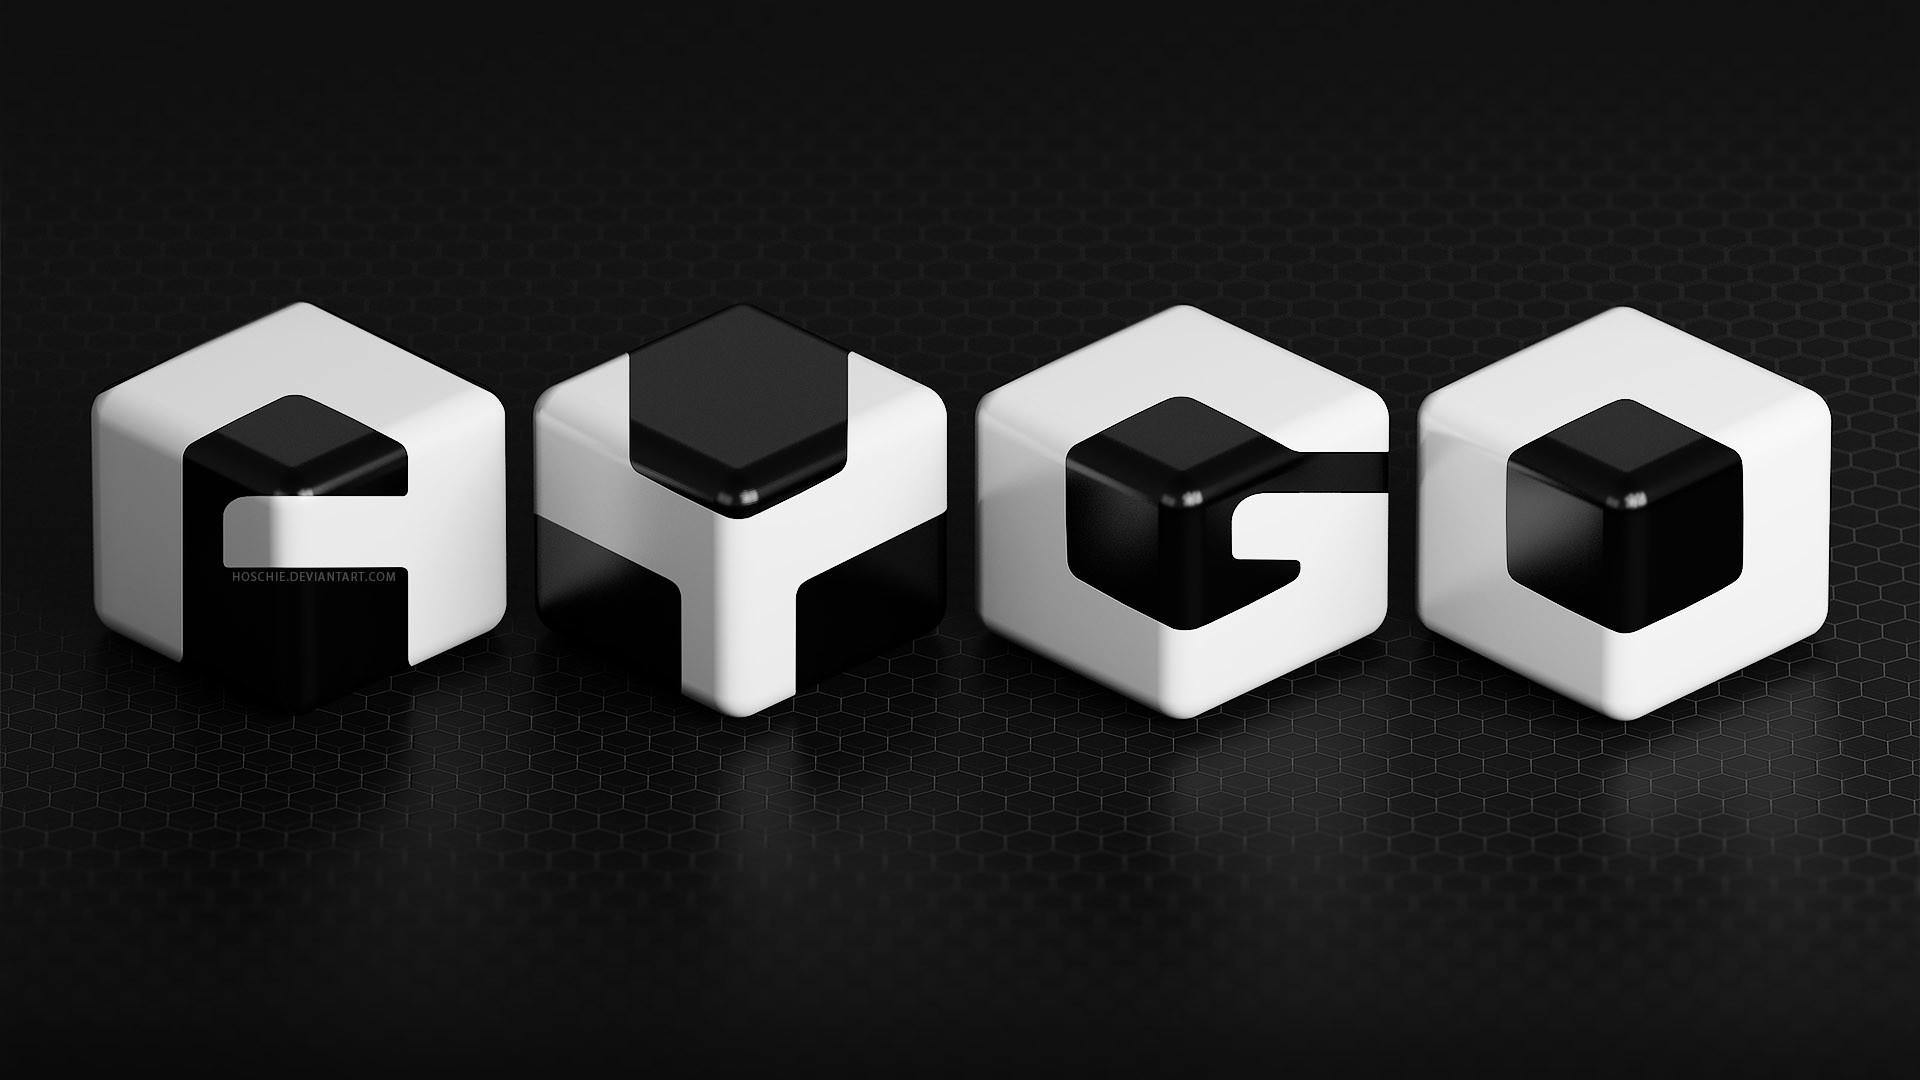 … AYGO 3D wallpaper 1 by hoschie